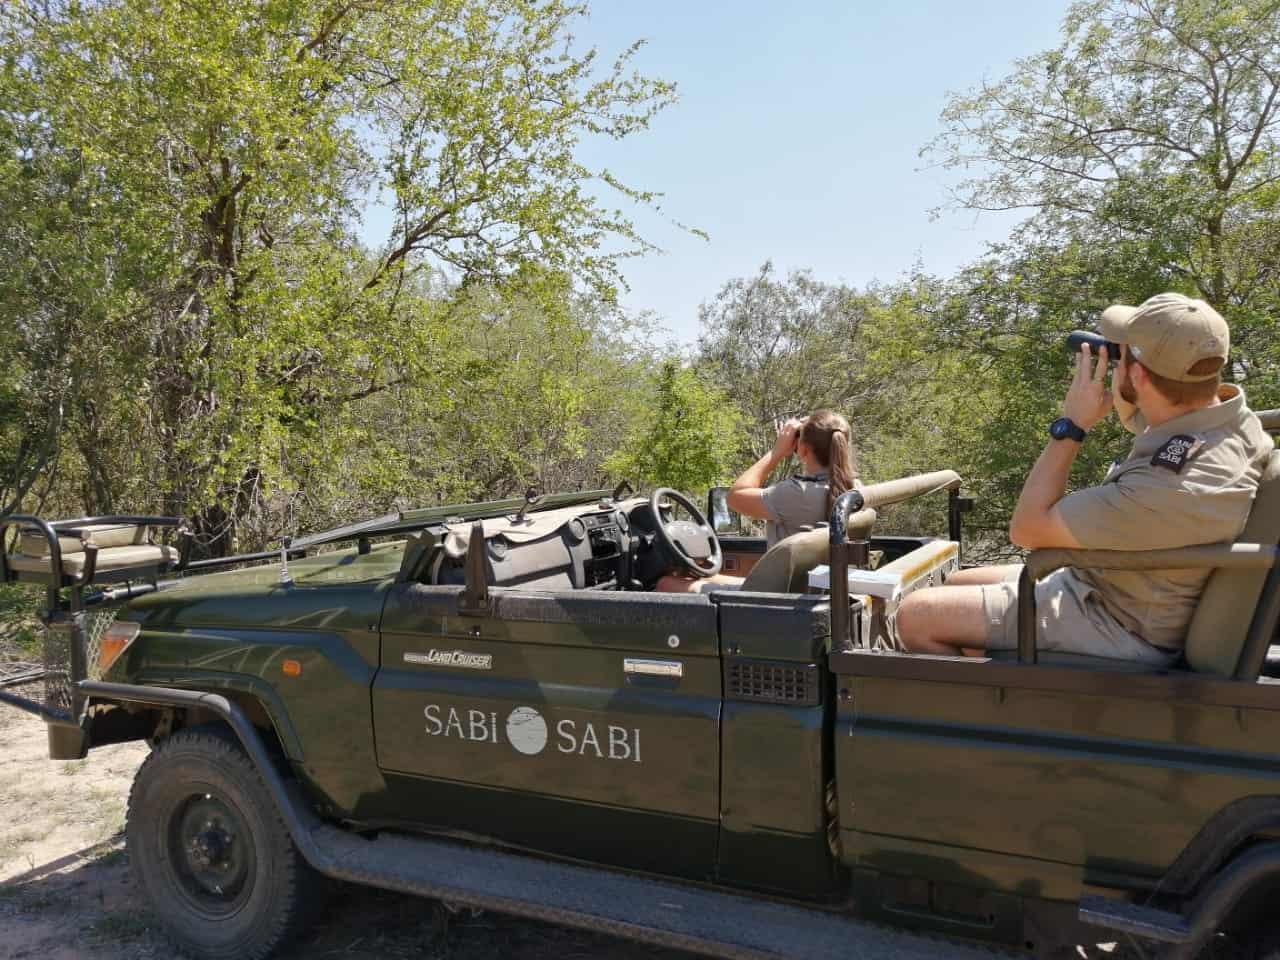 sabi sabi game rangers birding safari